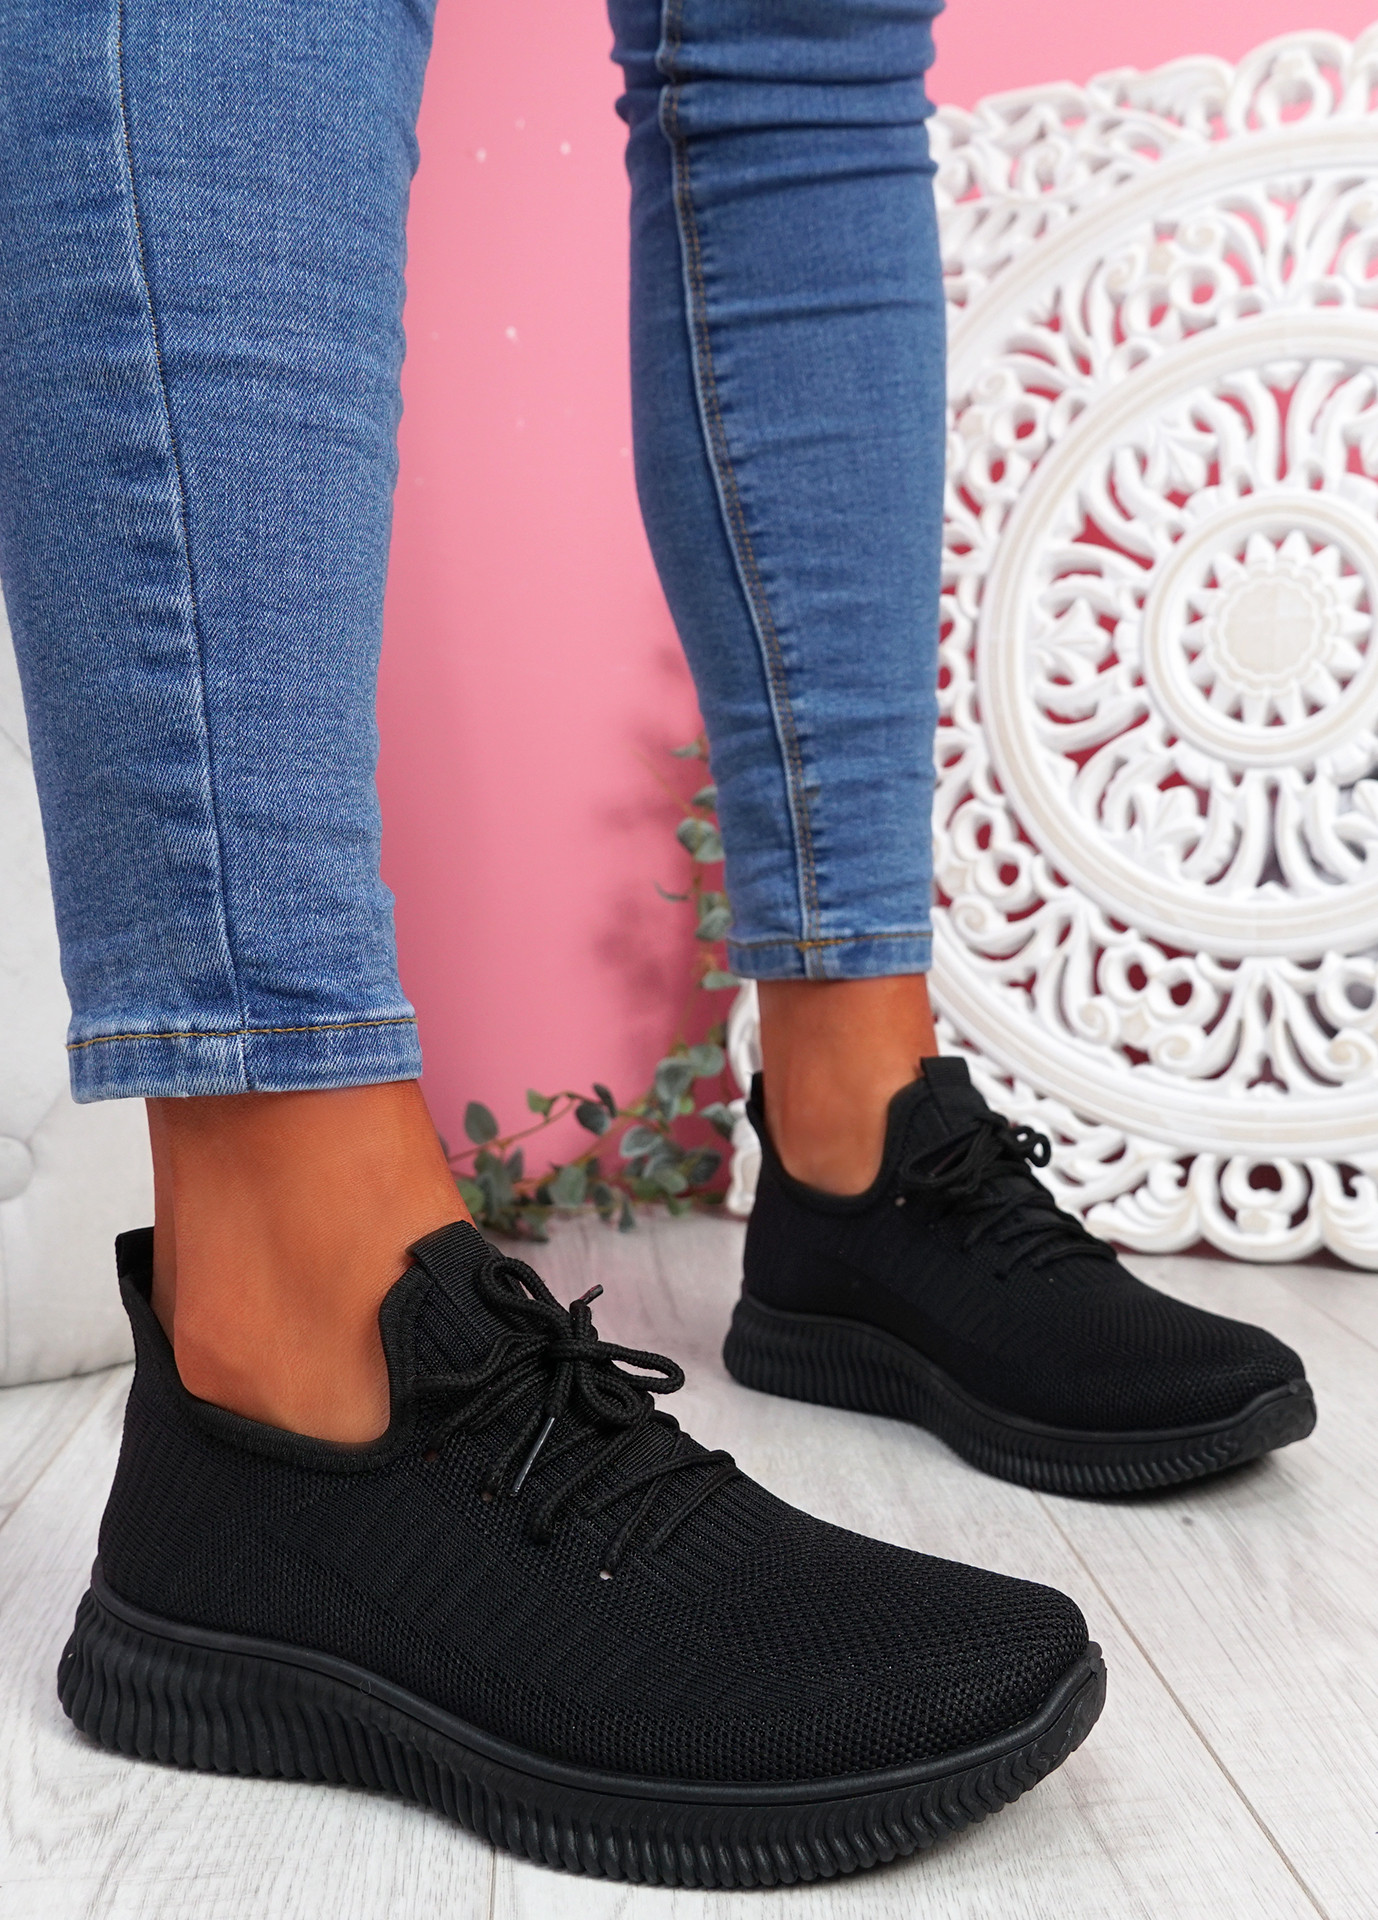 Fovy Black Knit Running Sneakers